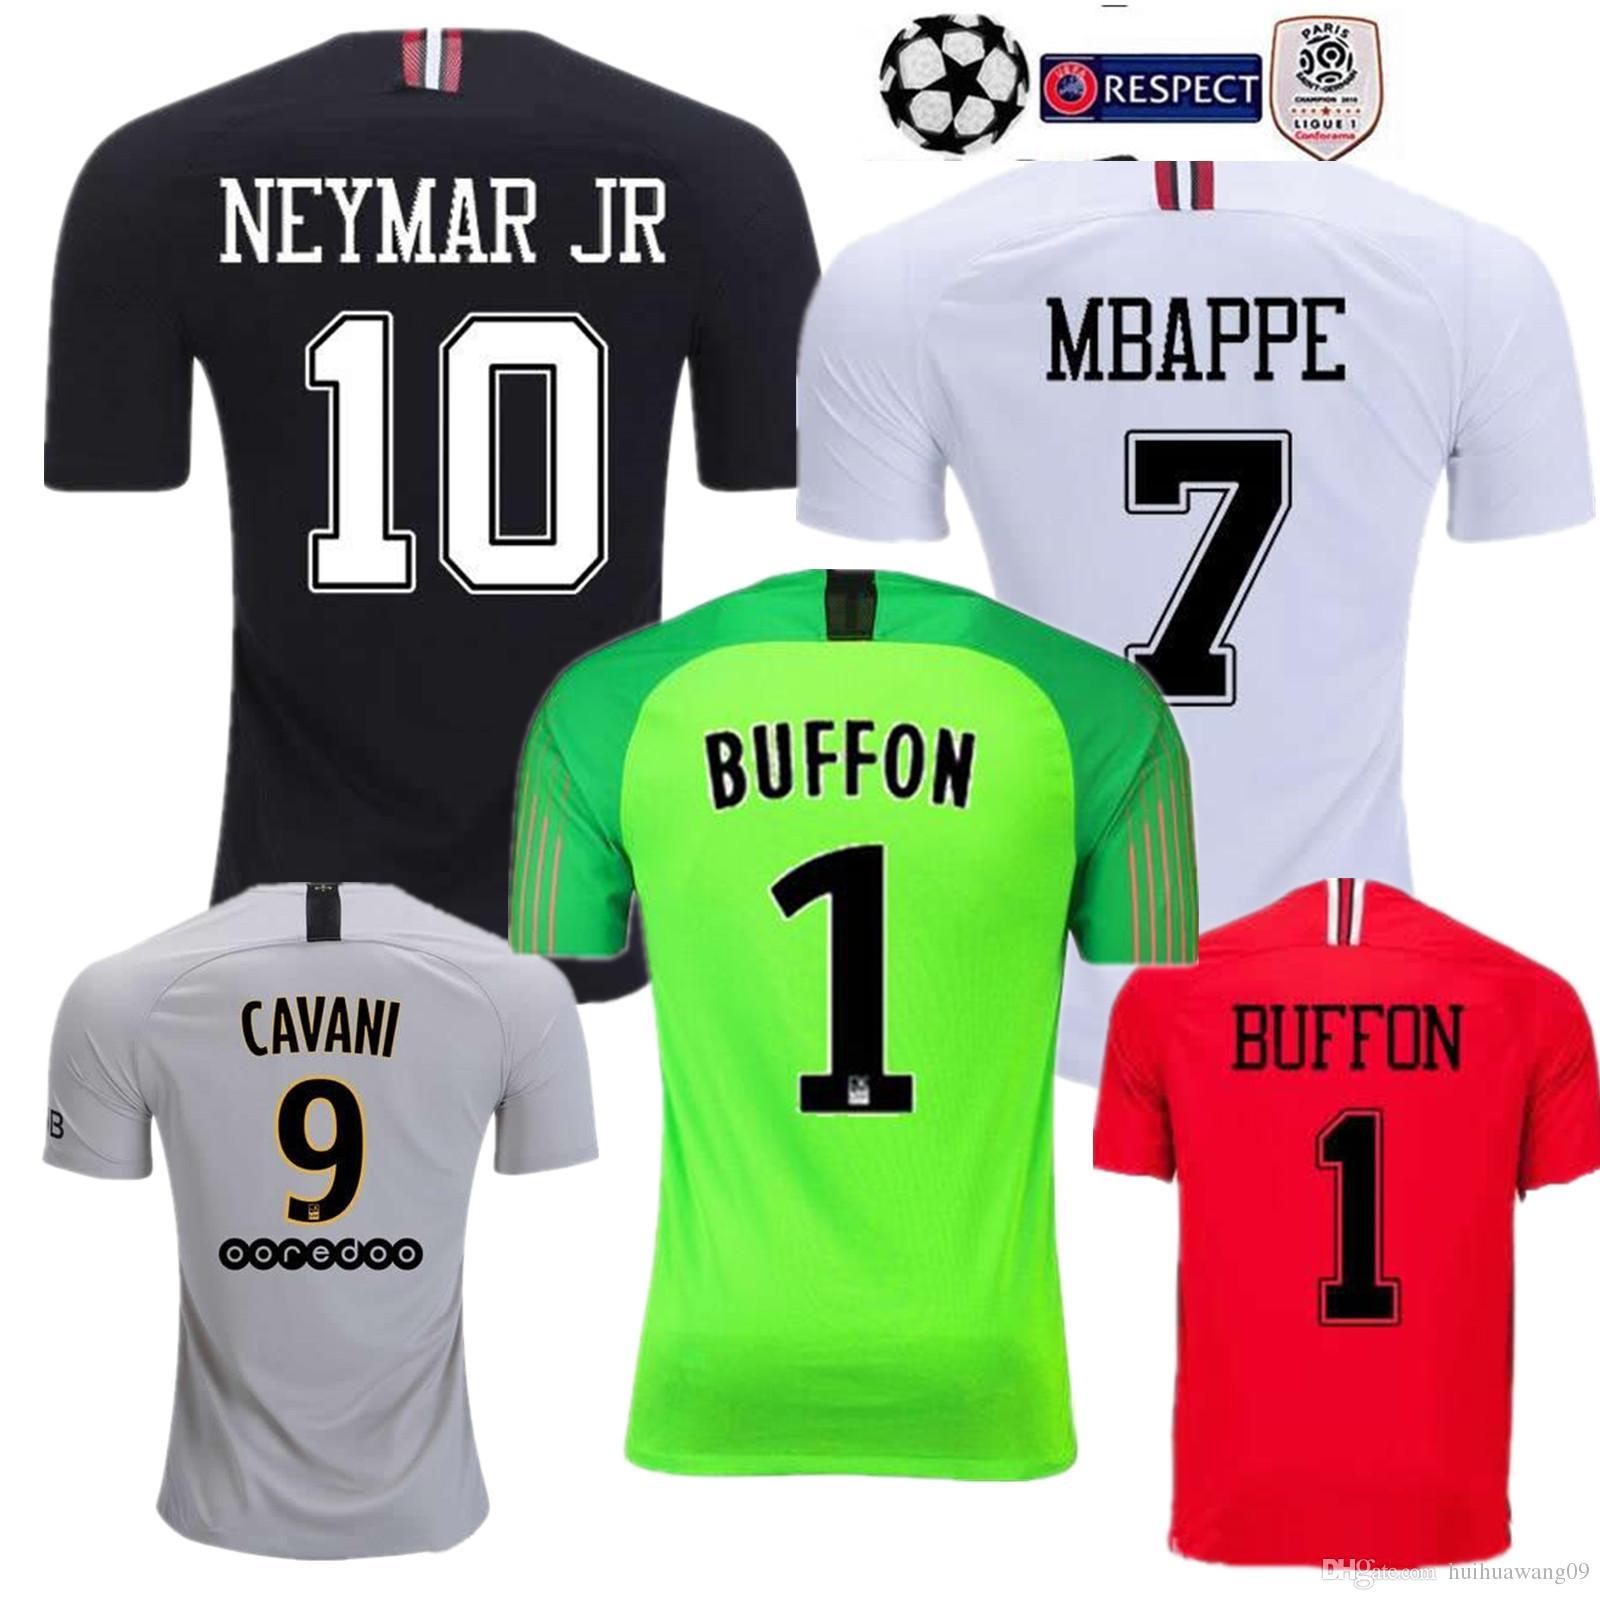 official photos a11c4 dfba5 33 Goalkeeper T Shirt 18 19 Mbappe League Dhgate Paris From ...